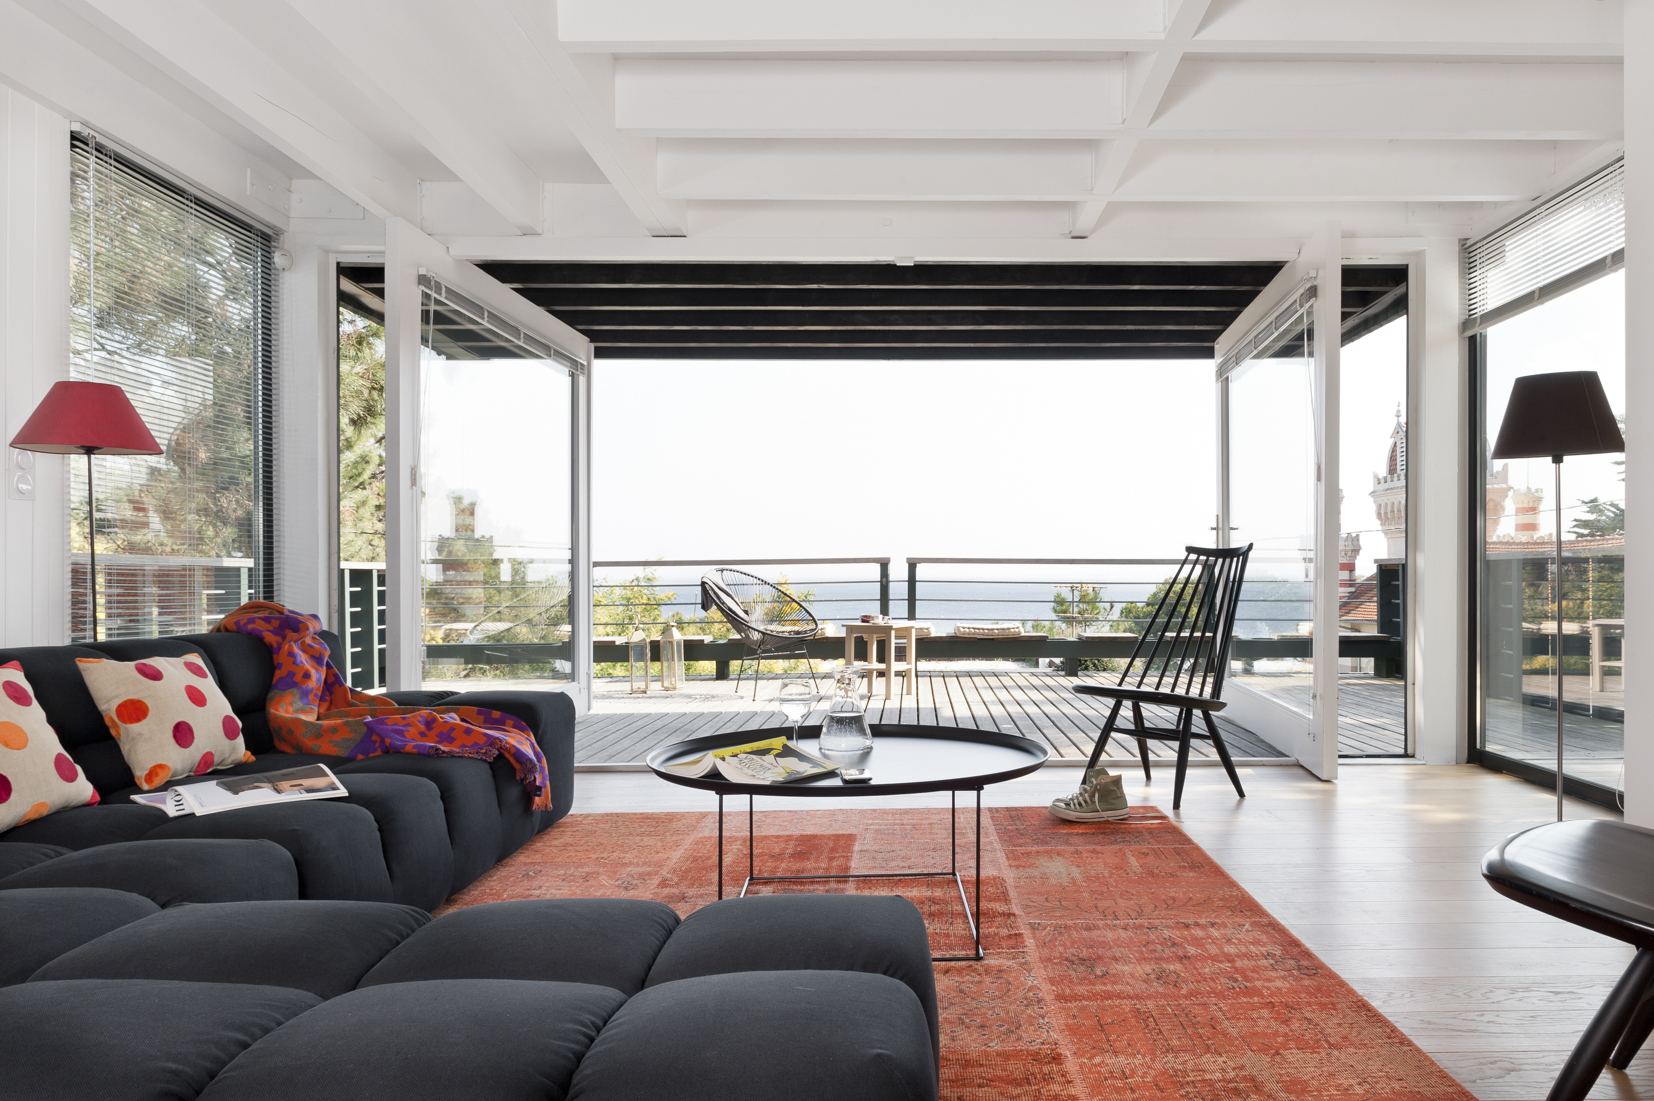 Moradia para Venda às Villa near the beach with view basin d'Arcachon Cap Ferret, Aquitaine 33950 França